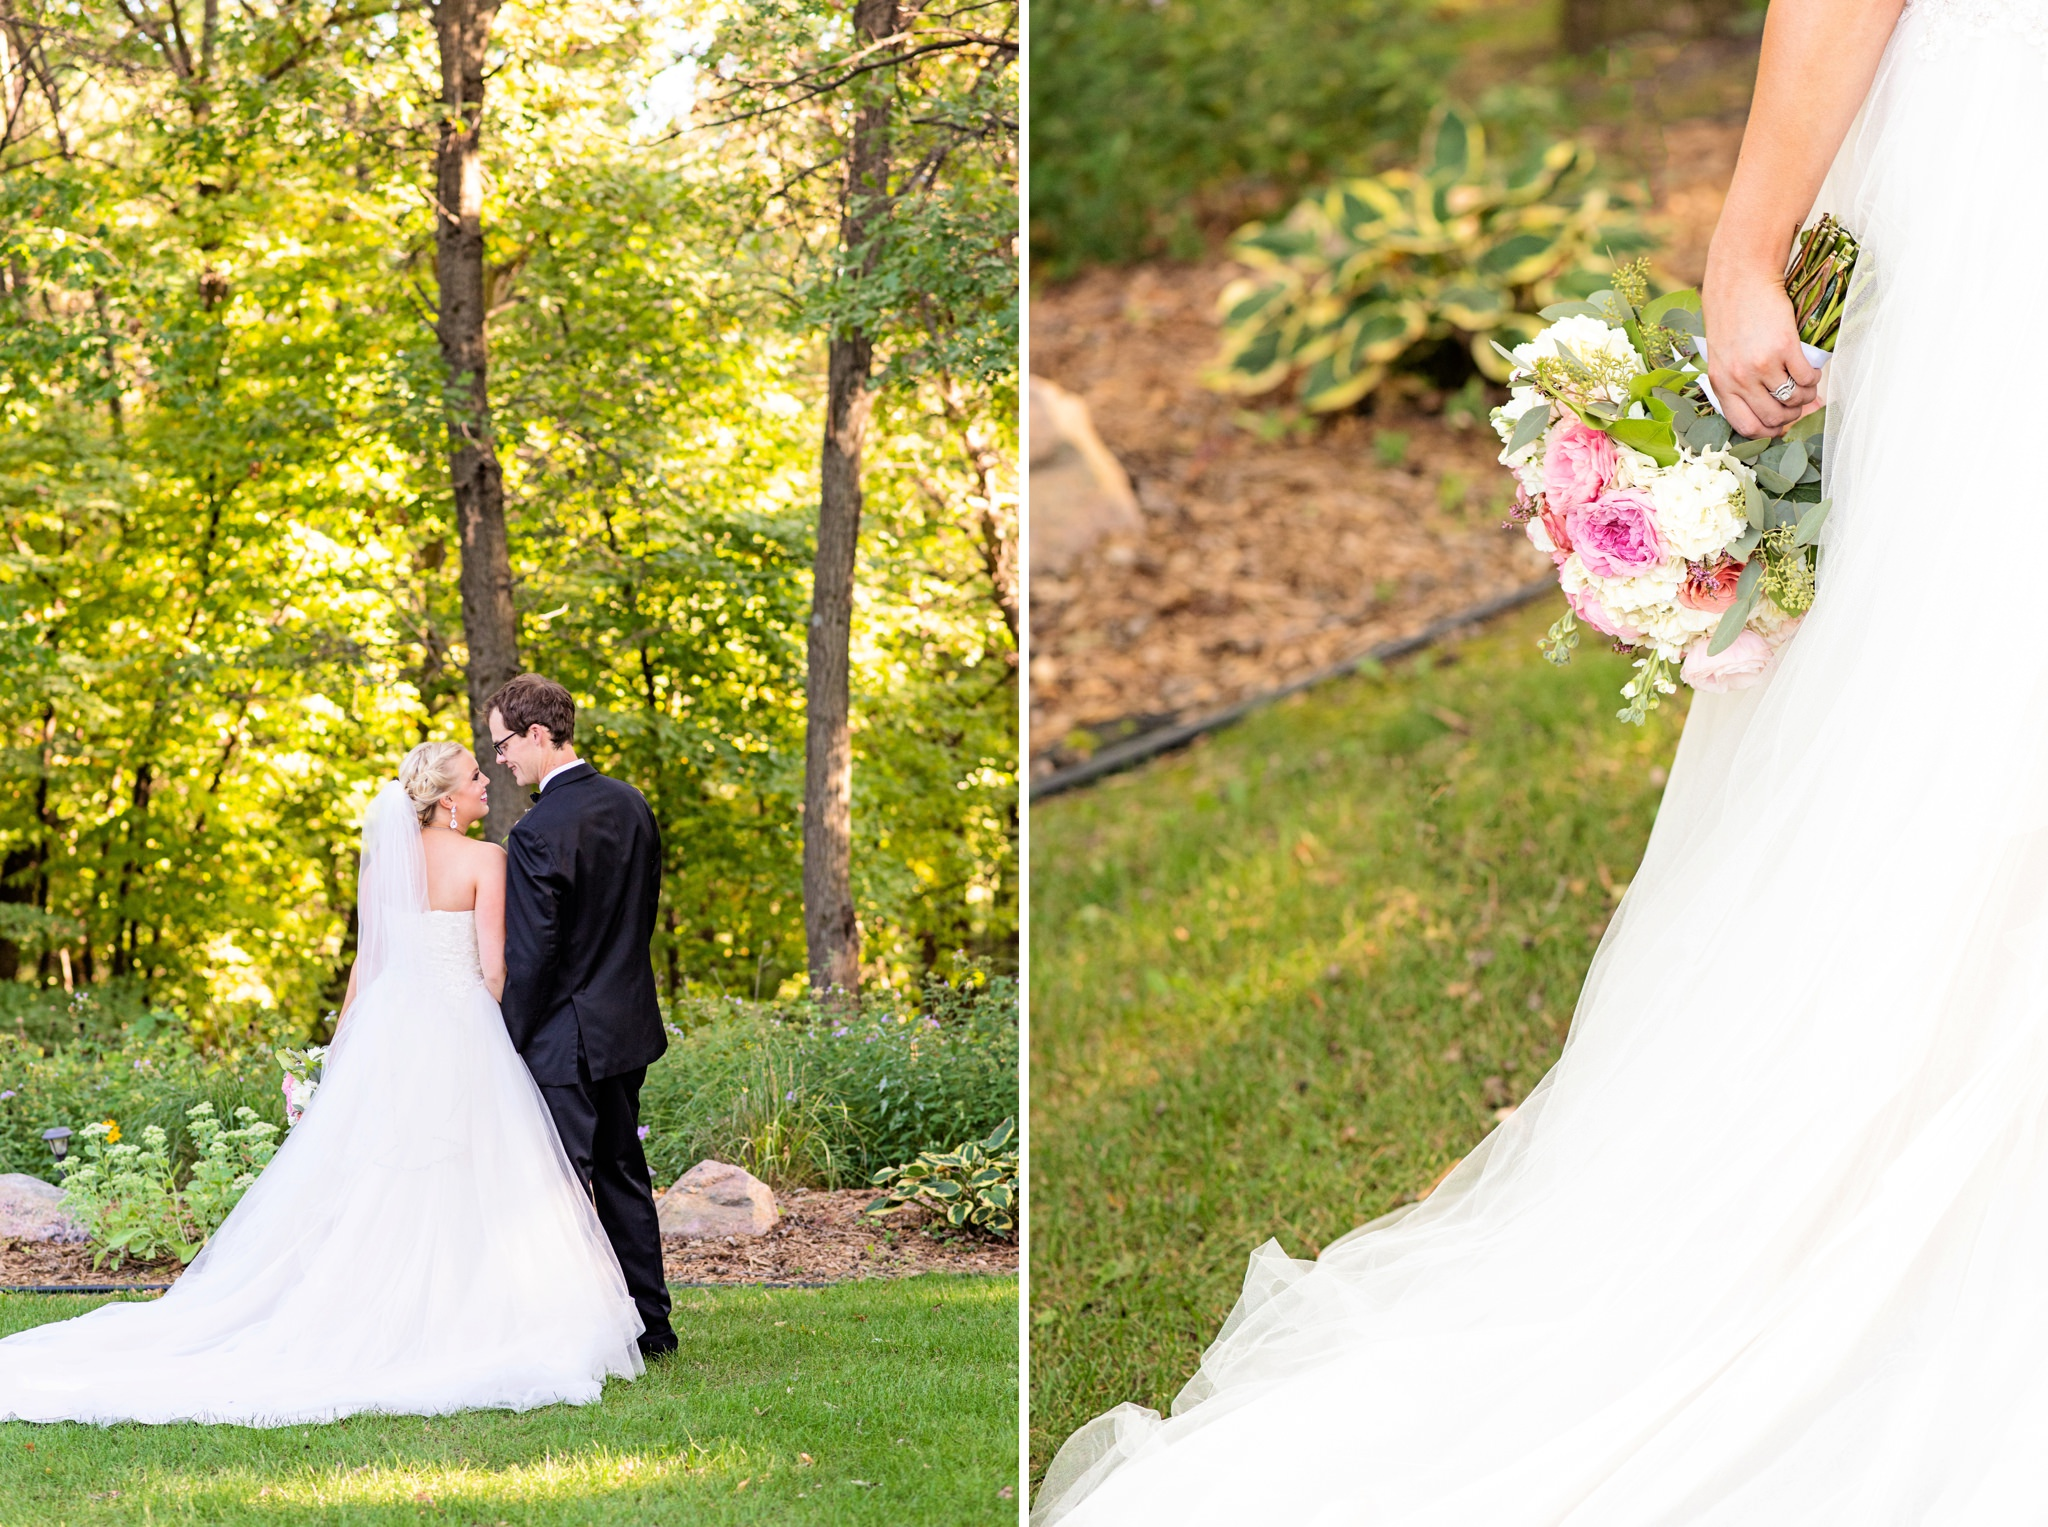 Brittany-Jay-Wedding-091518-Rotella-Photography-24_BLOG.jpg